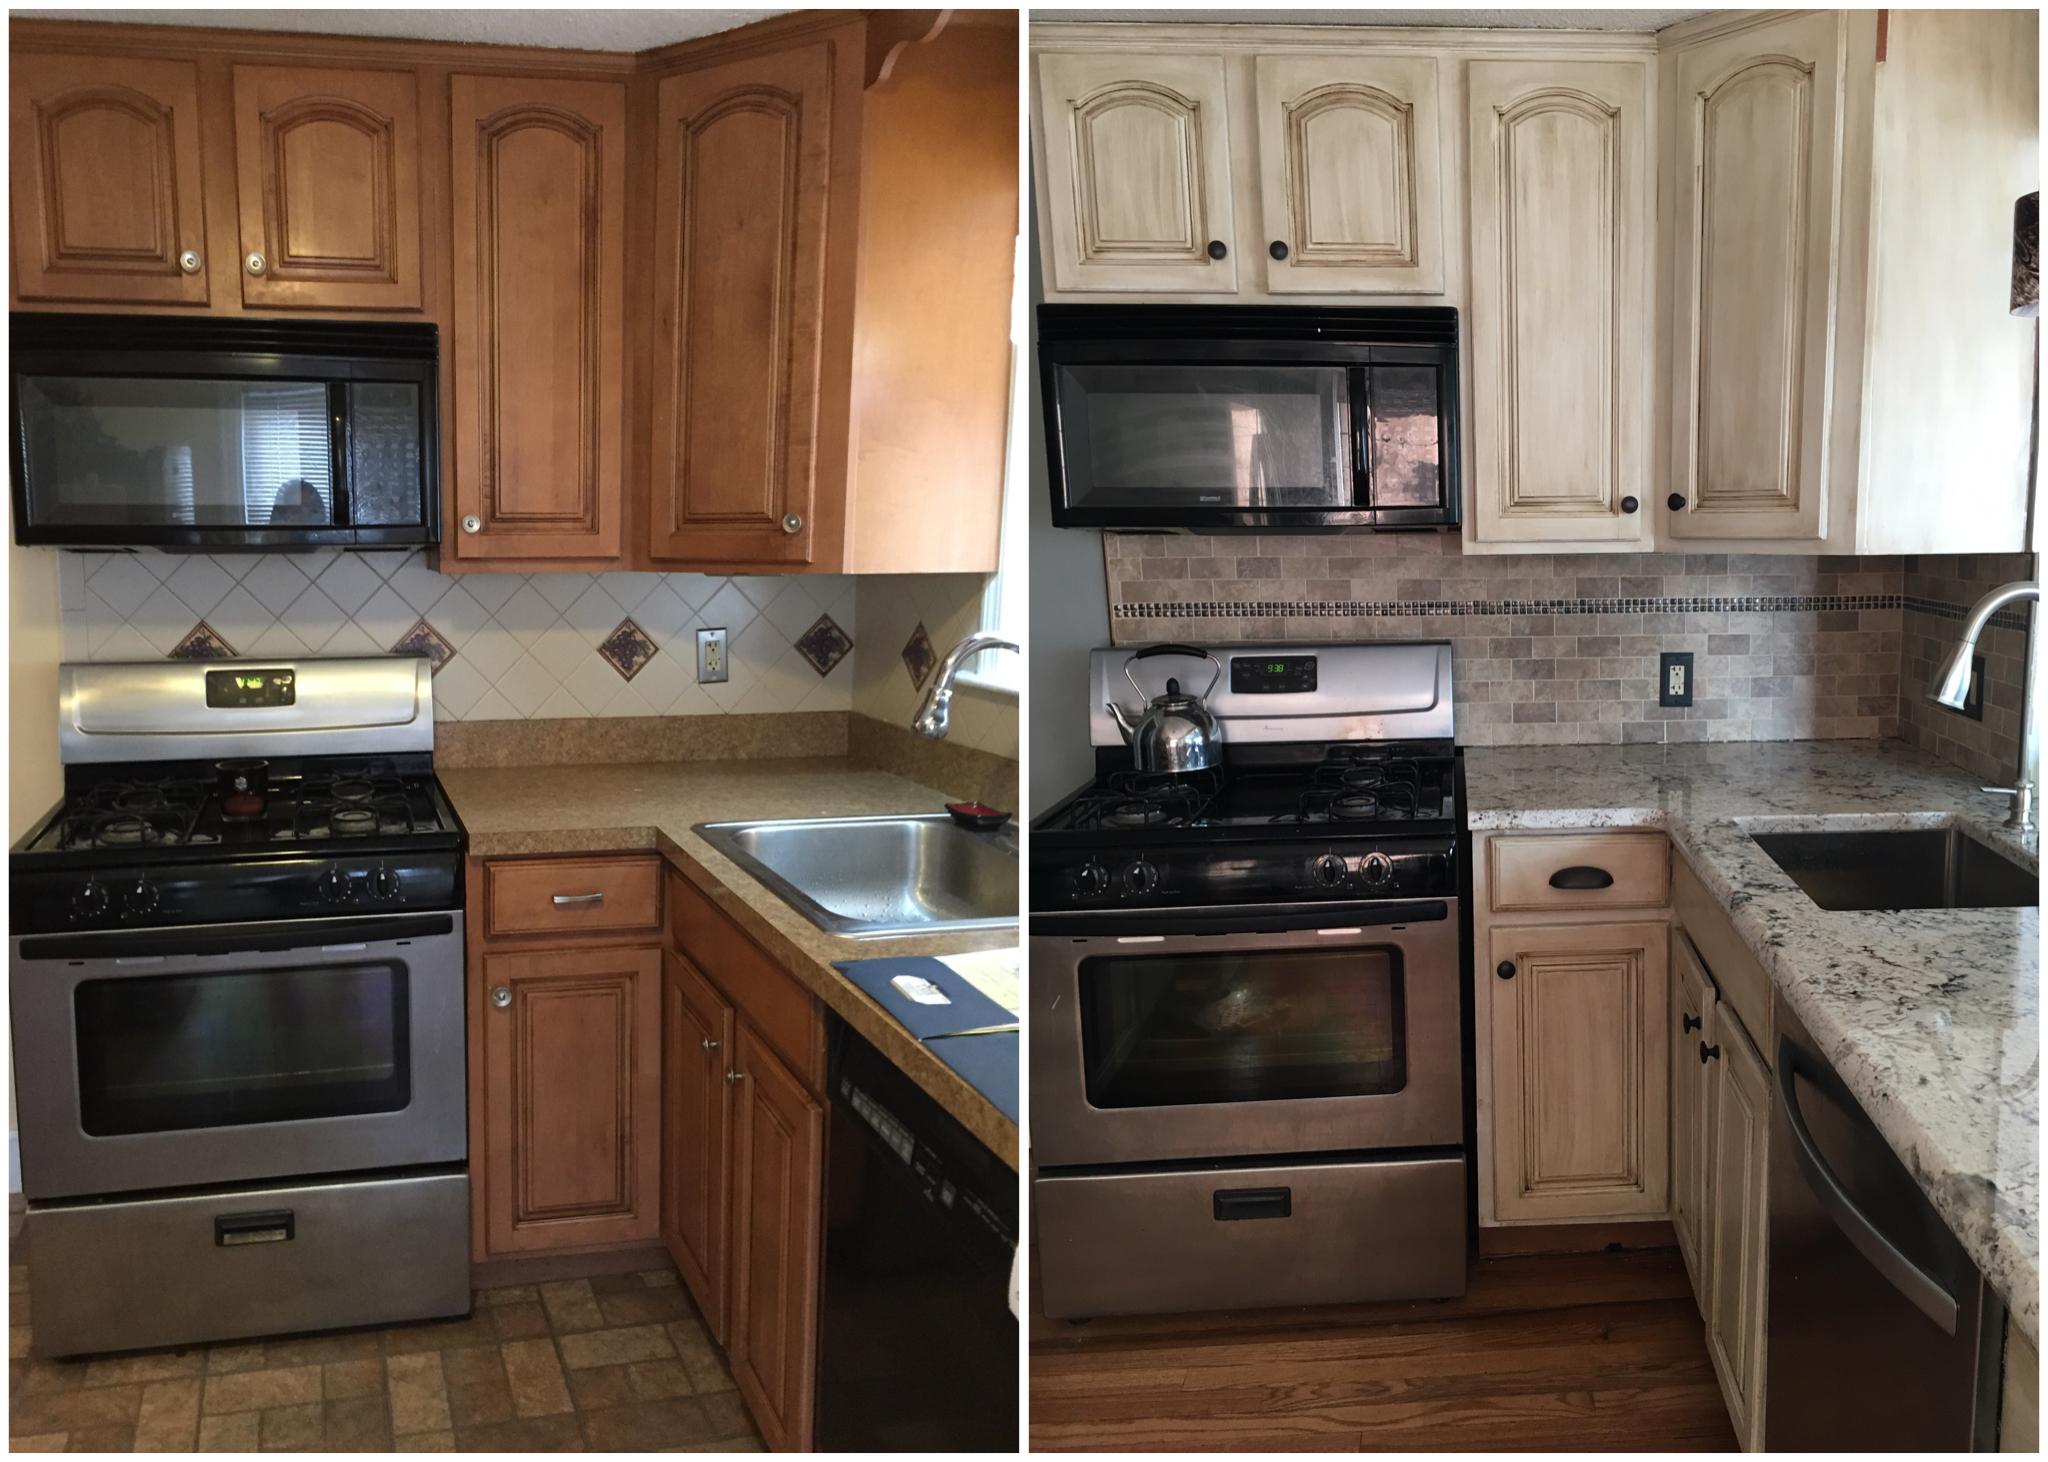 Rustoleum Cabinet Transformations Glaze or No Glaze | Kitchen Cabinet Kits | Rustoleum Cabinet Transformations Reviews